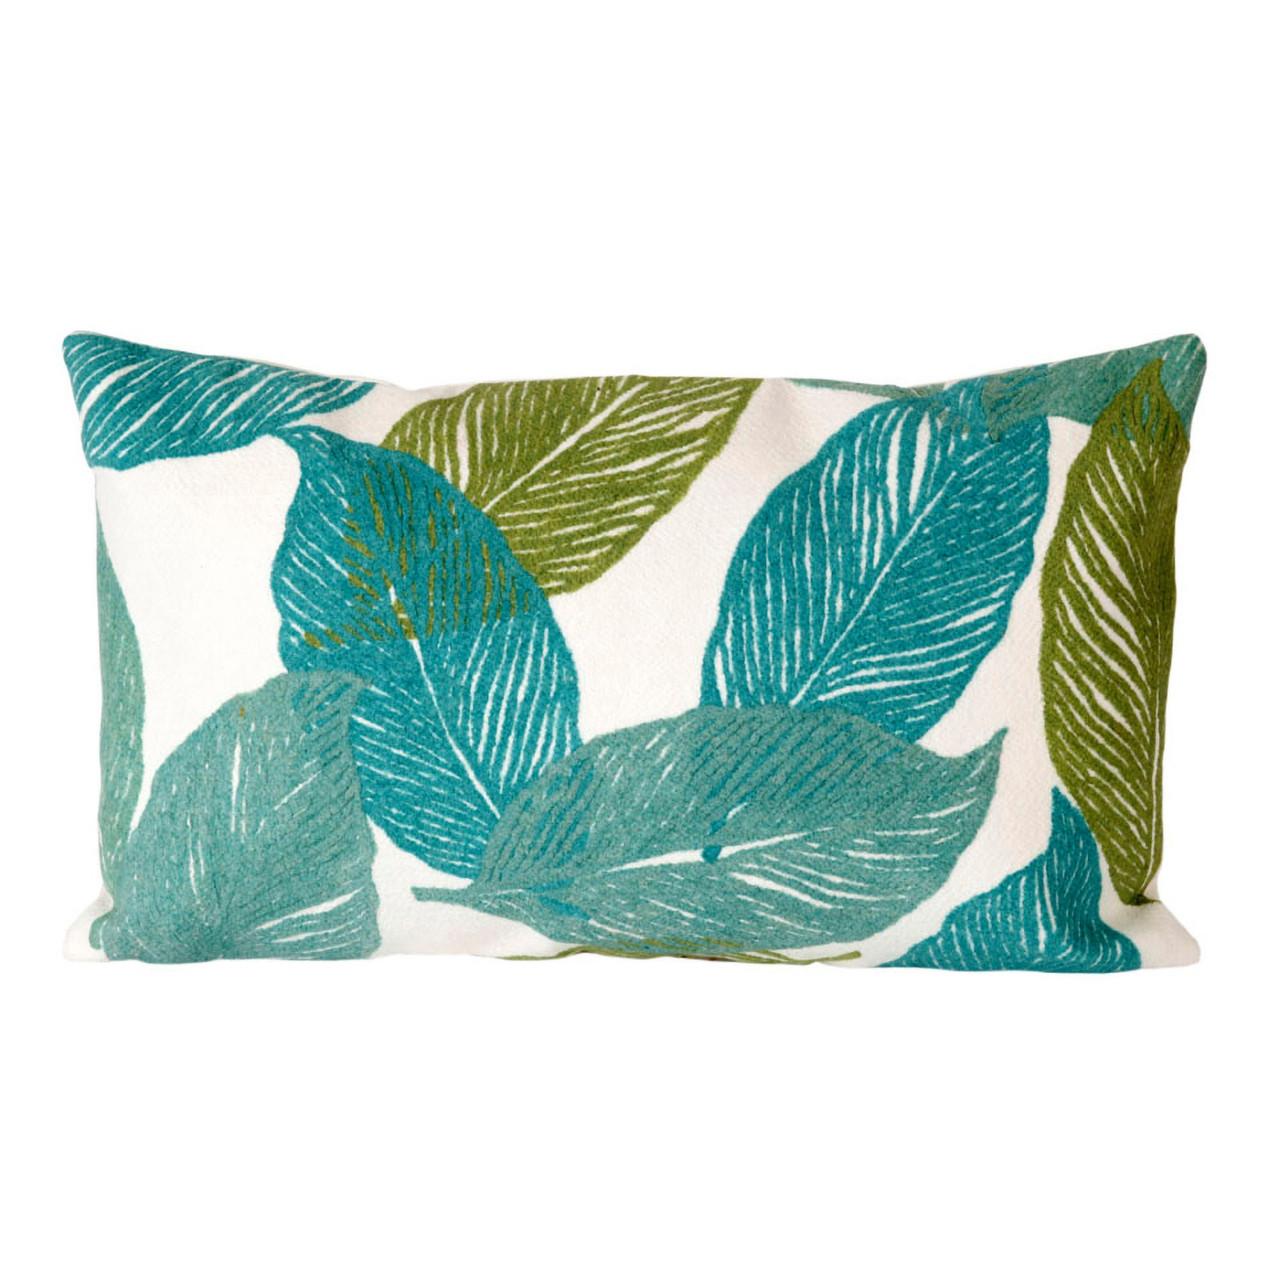 Visions Aqua Mystic Leaf Indoor/Outdoor Throw Pillow -  Lumbar Rectangle